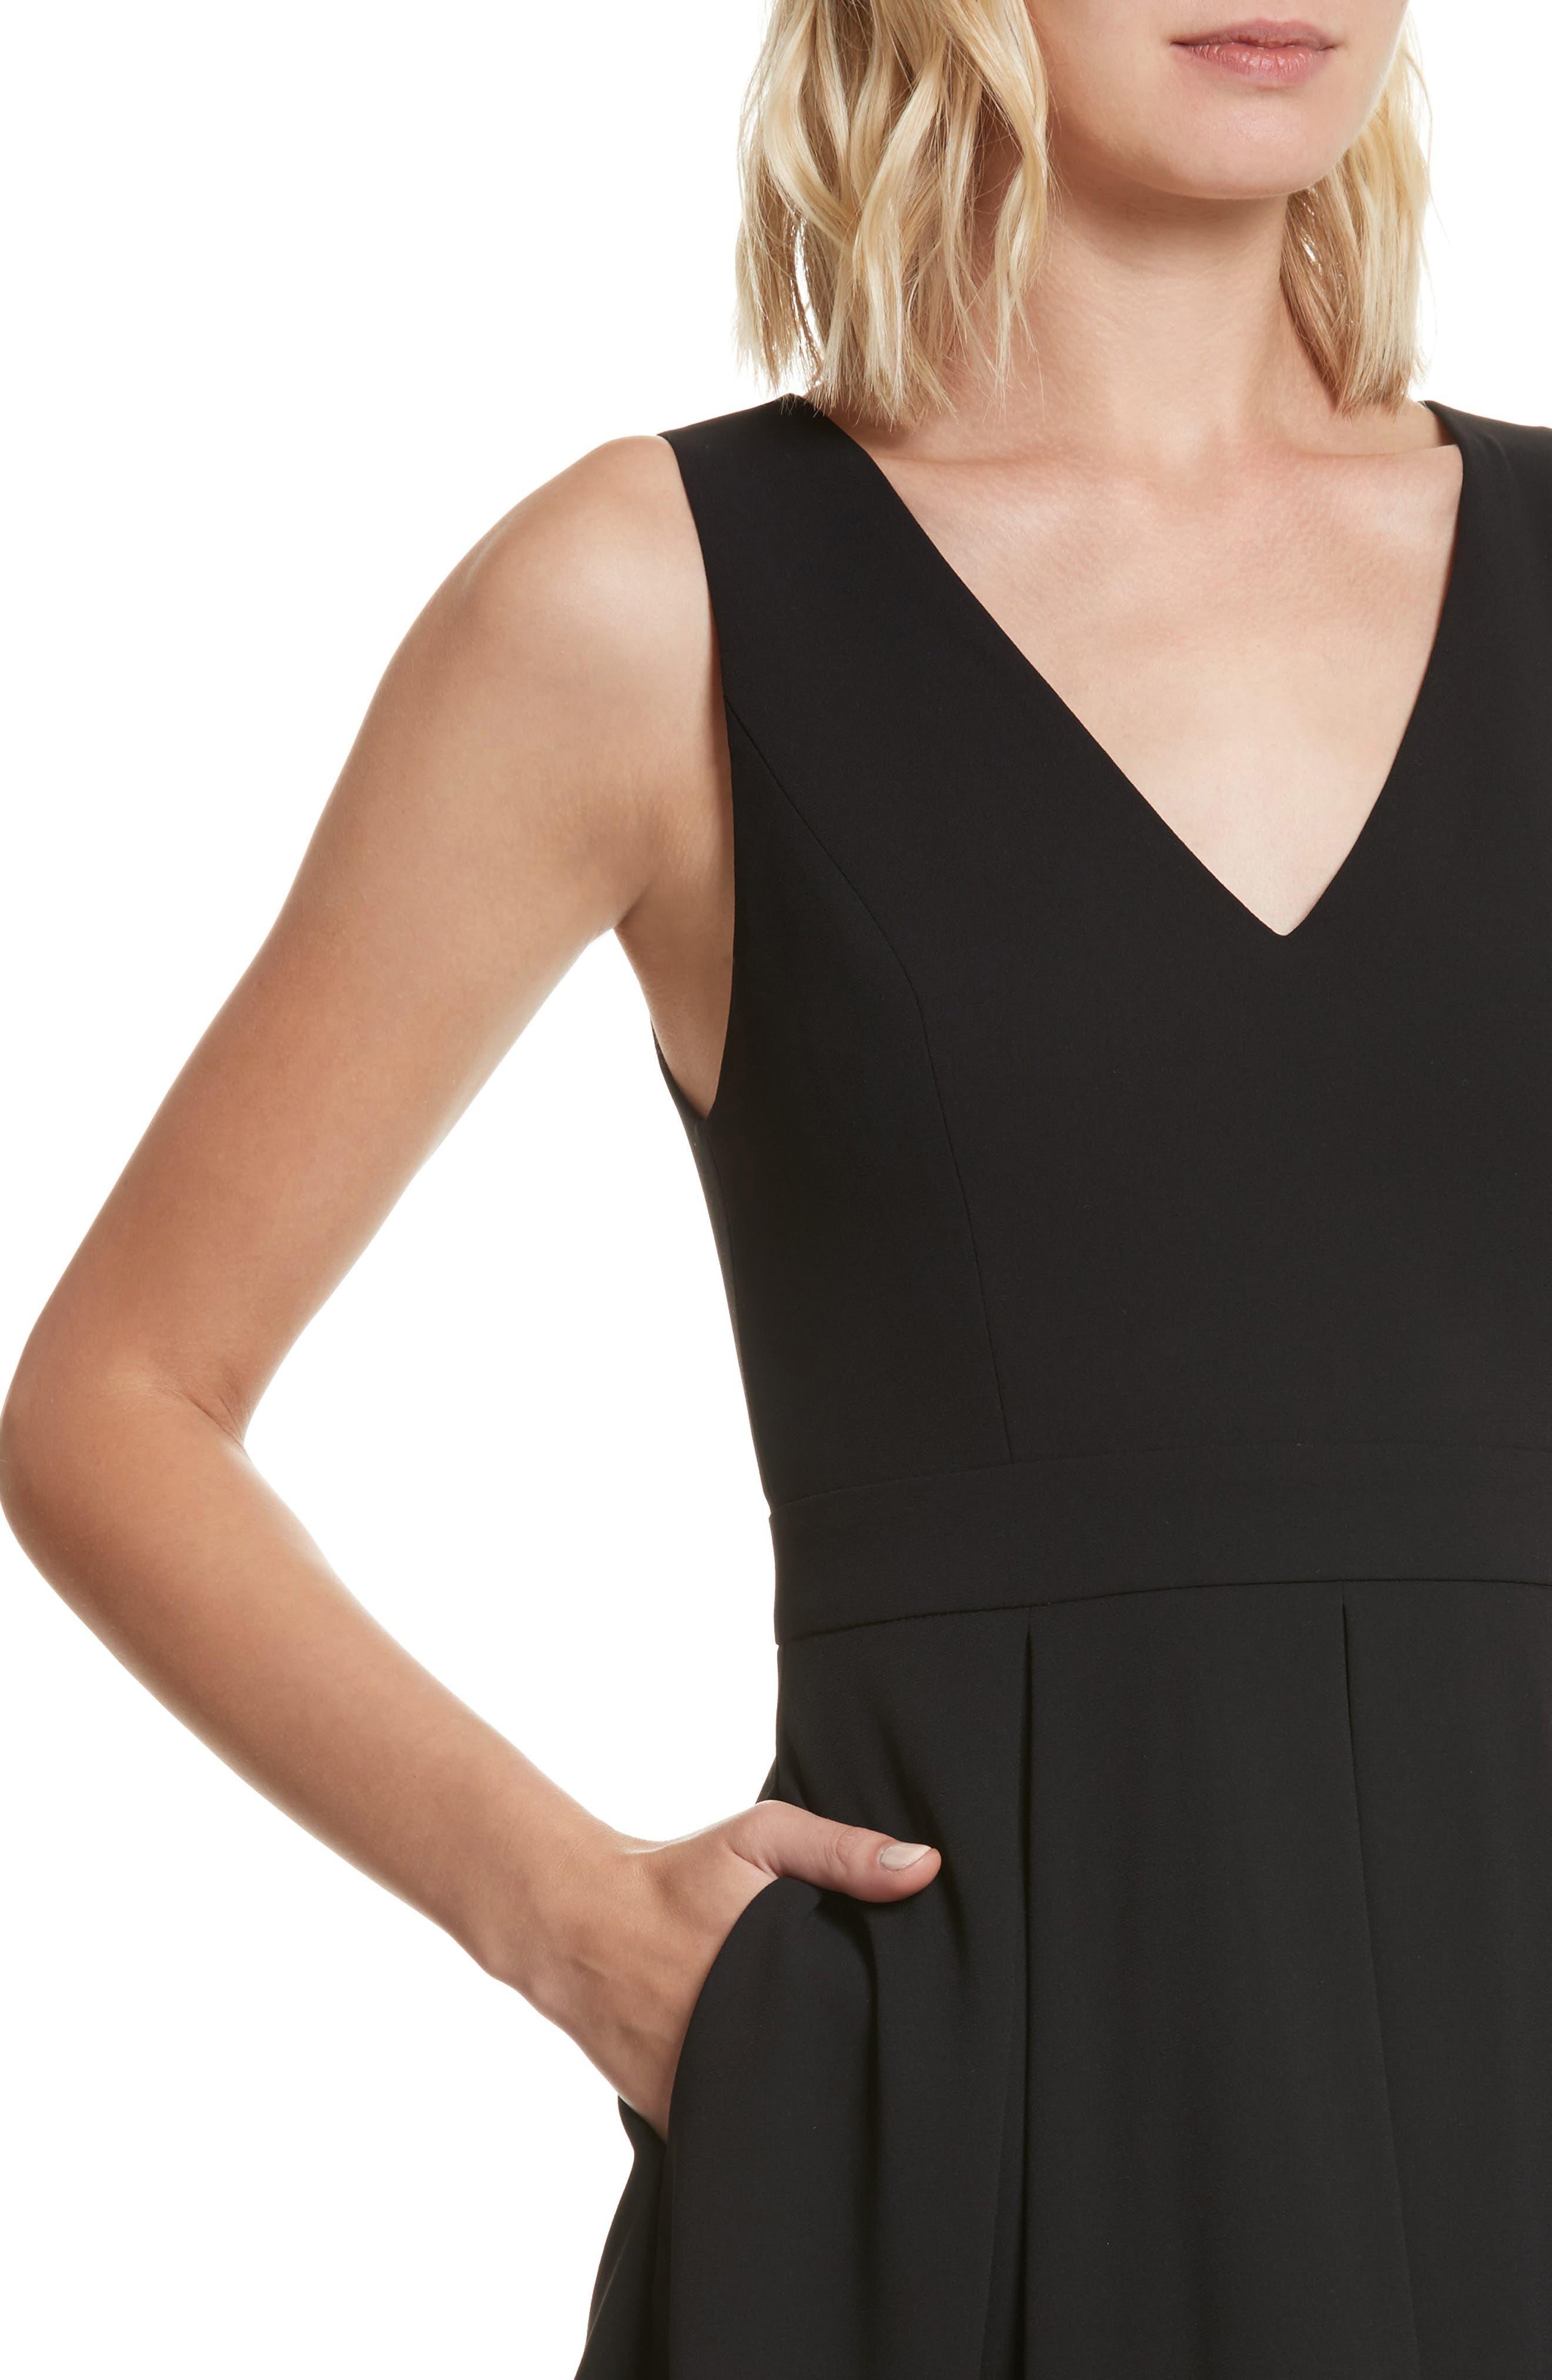 Julieta Inverted Pleat Fit & Flare Dress,                             Alternate thumbnail 4, color,                             Black